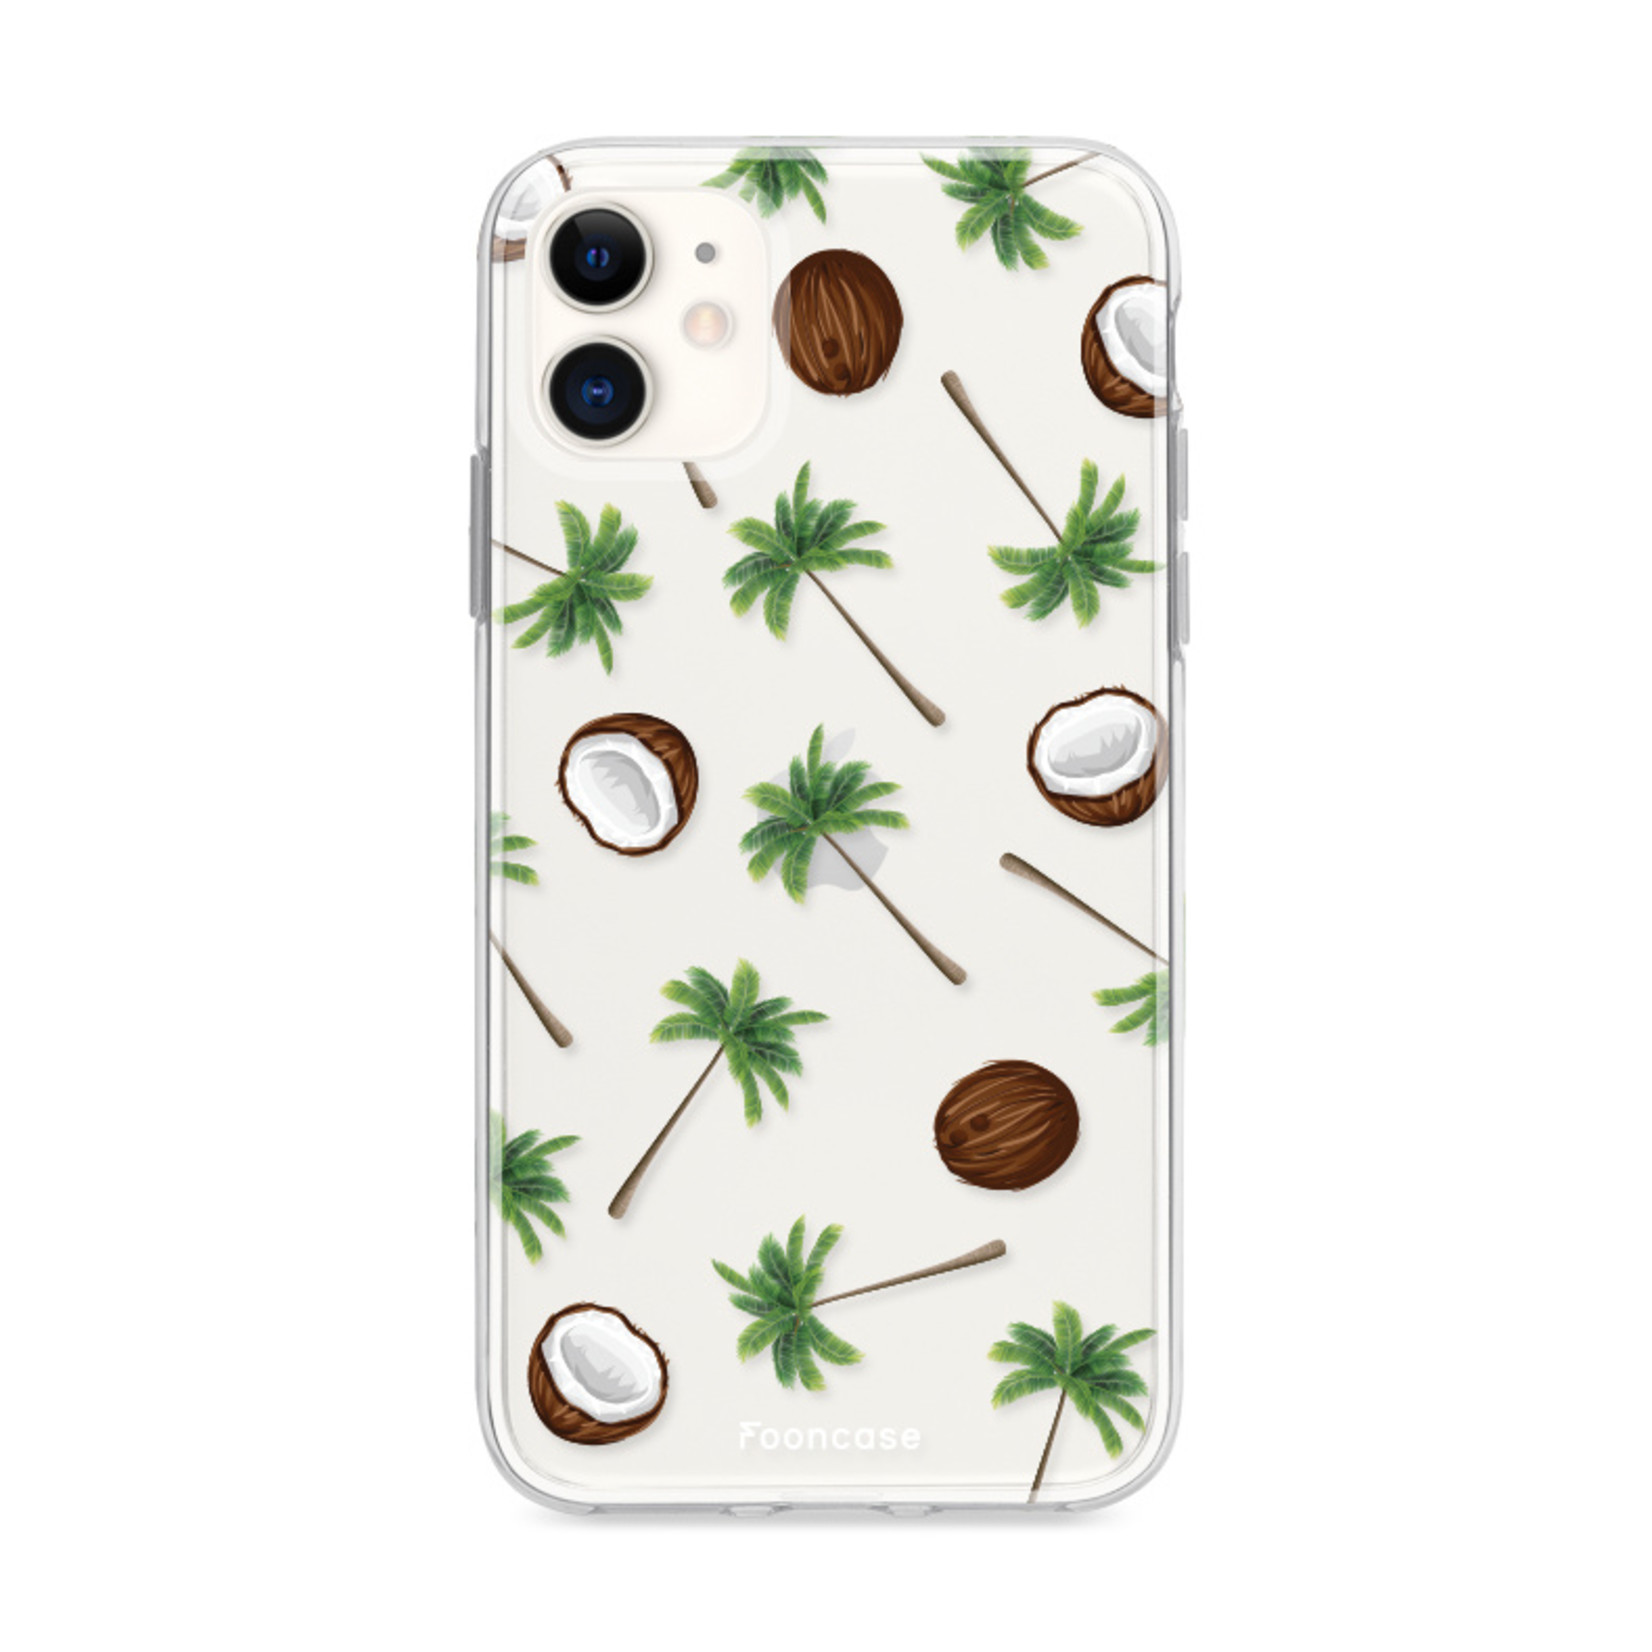 FOONCASE iPhone 11 hoesje TPU Soft Case - Back Cover - Coco Paradise / Kokosnoot / Palmboom